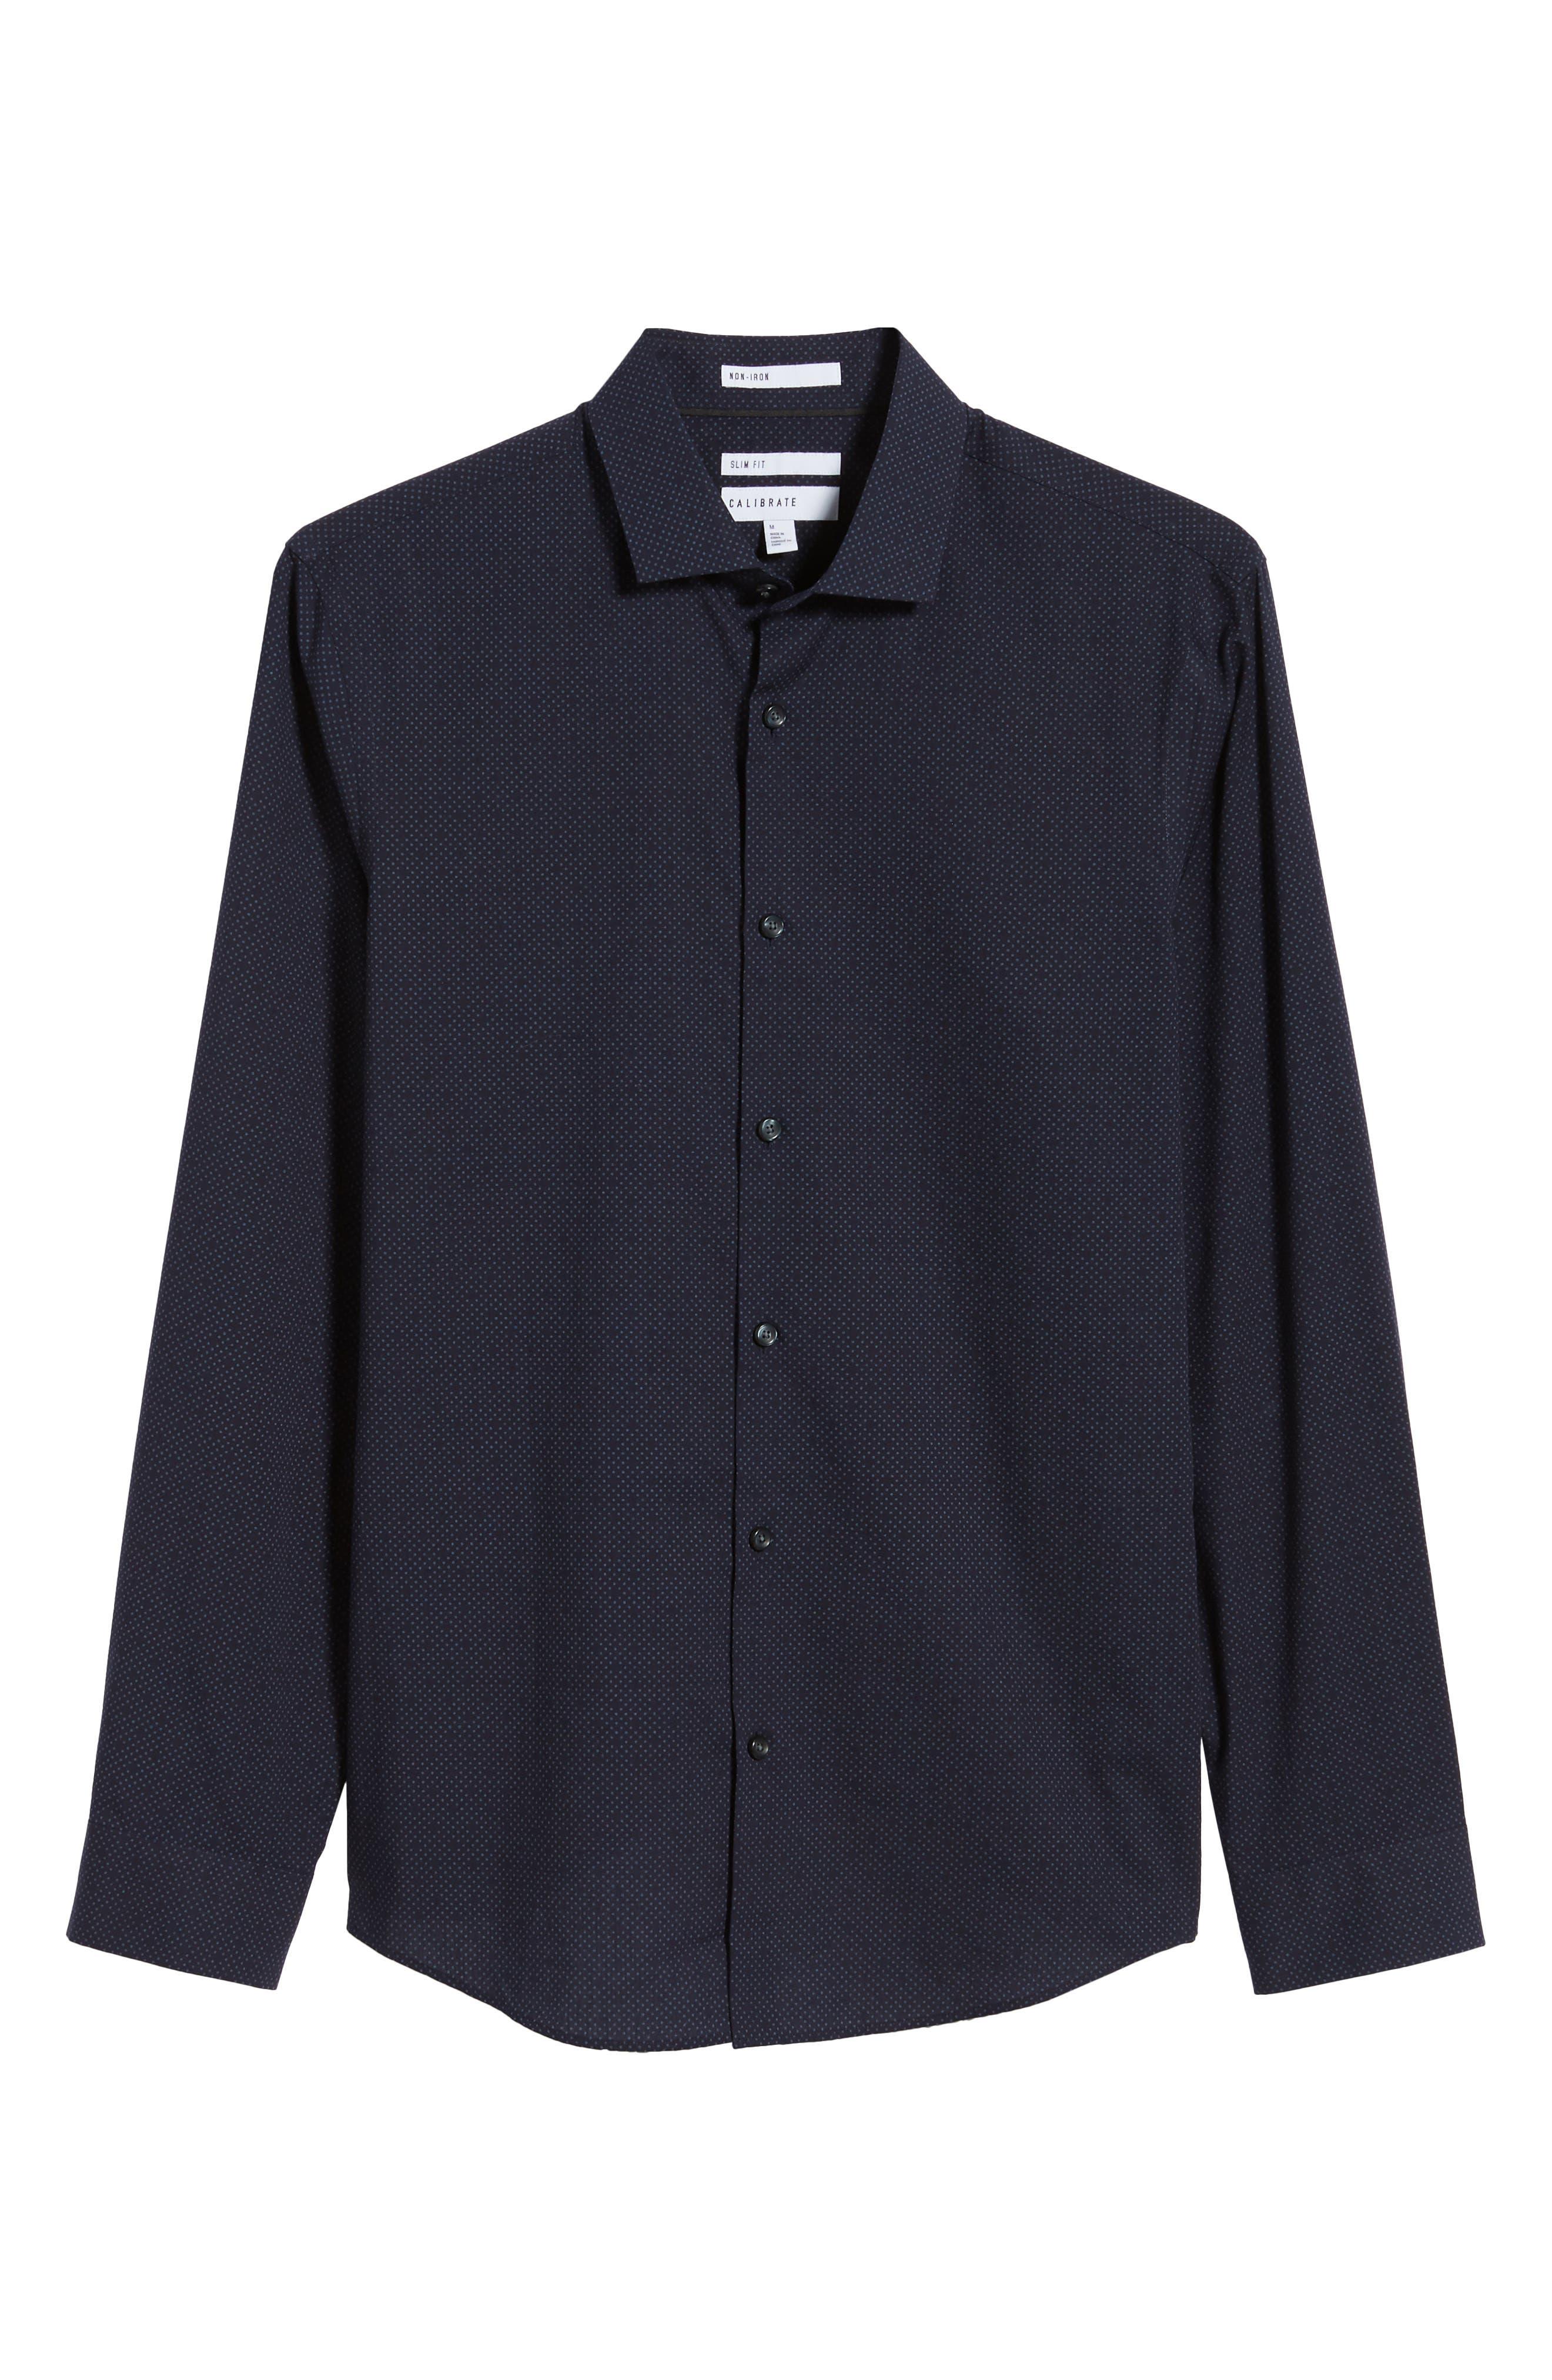 CALIBRATE,                             Slim Fit Dot Non-Iron Sport Shirt,                             Alternate thumbnail 6, color,                             410